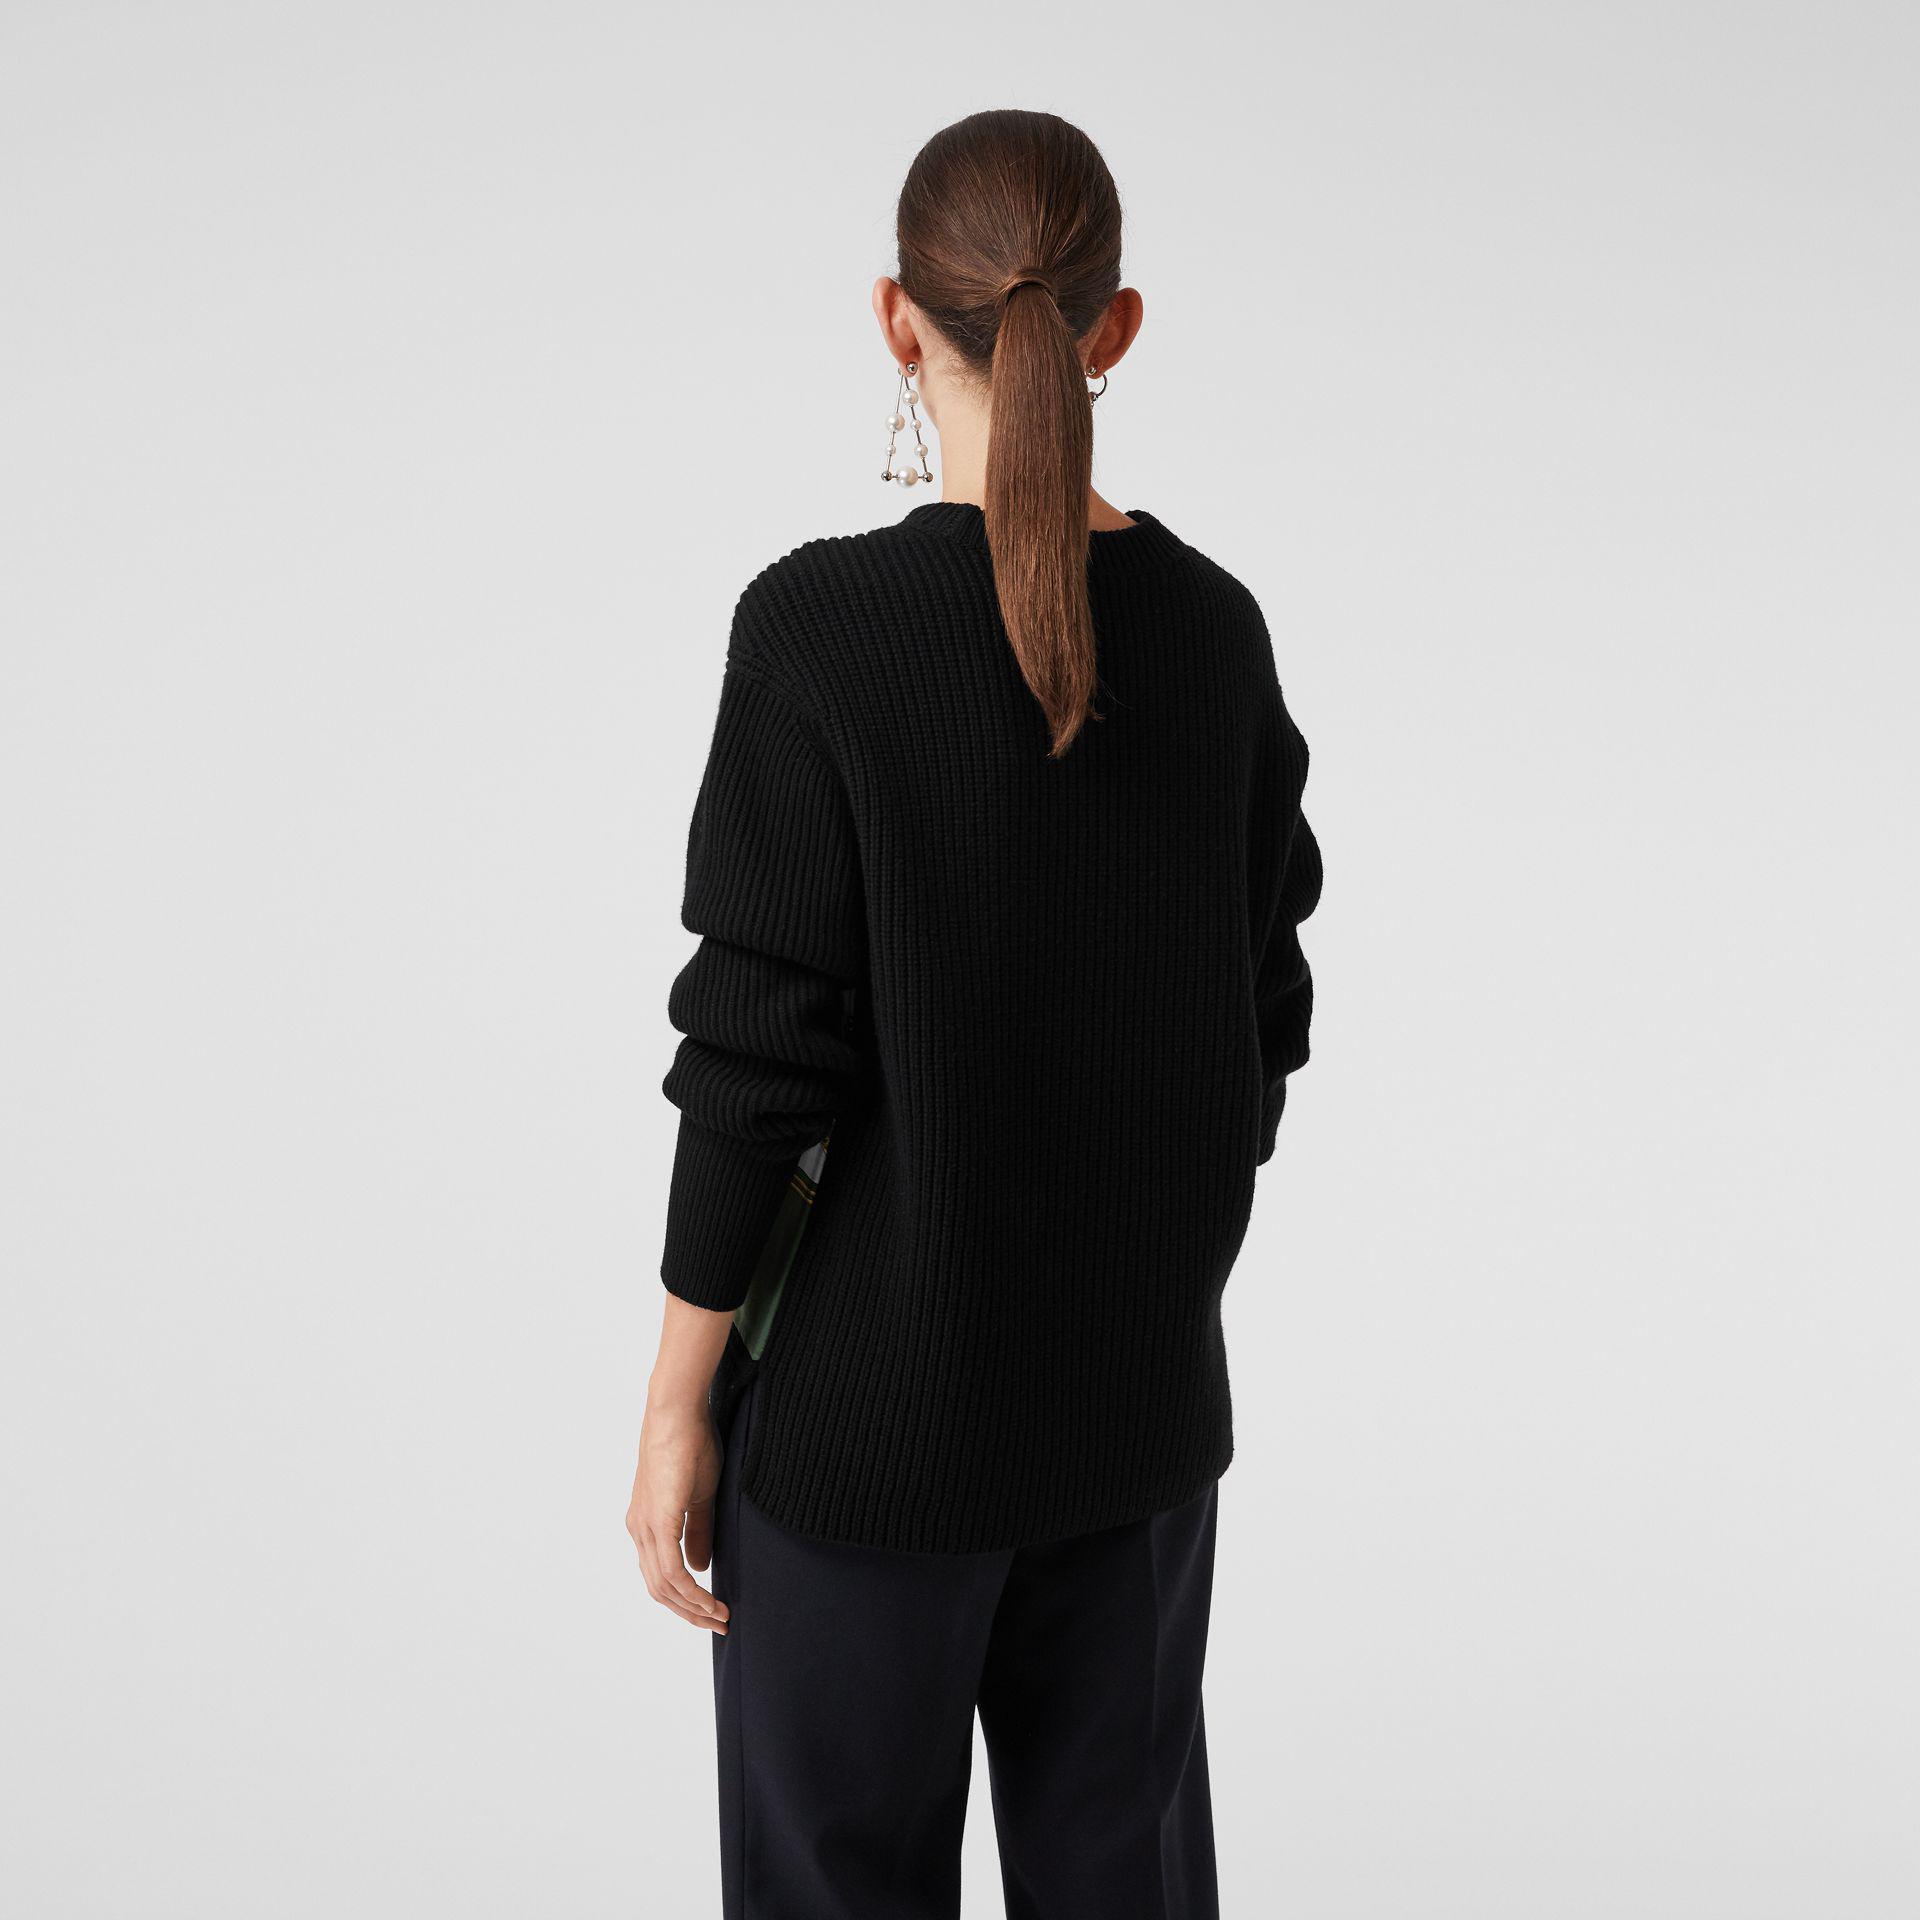 de2852b31874 Lyst - Burberry Archive Scarf Print Panel Wool Sweater in Black